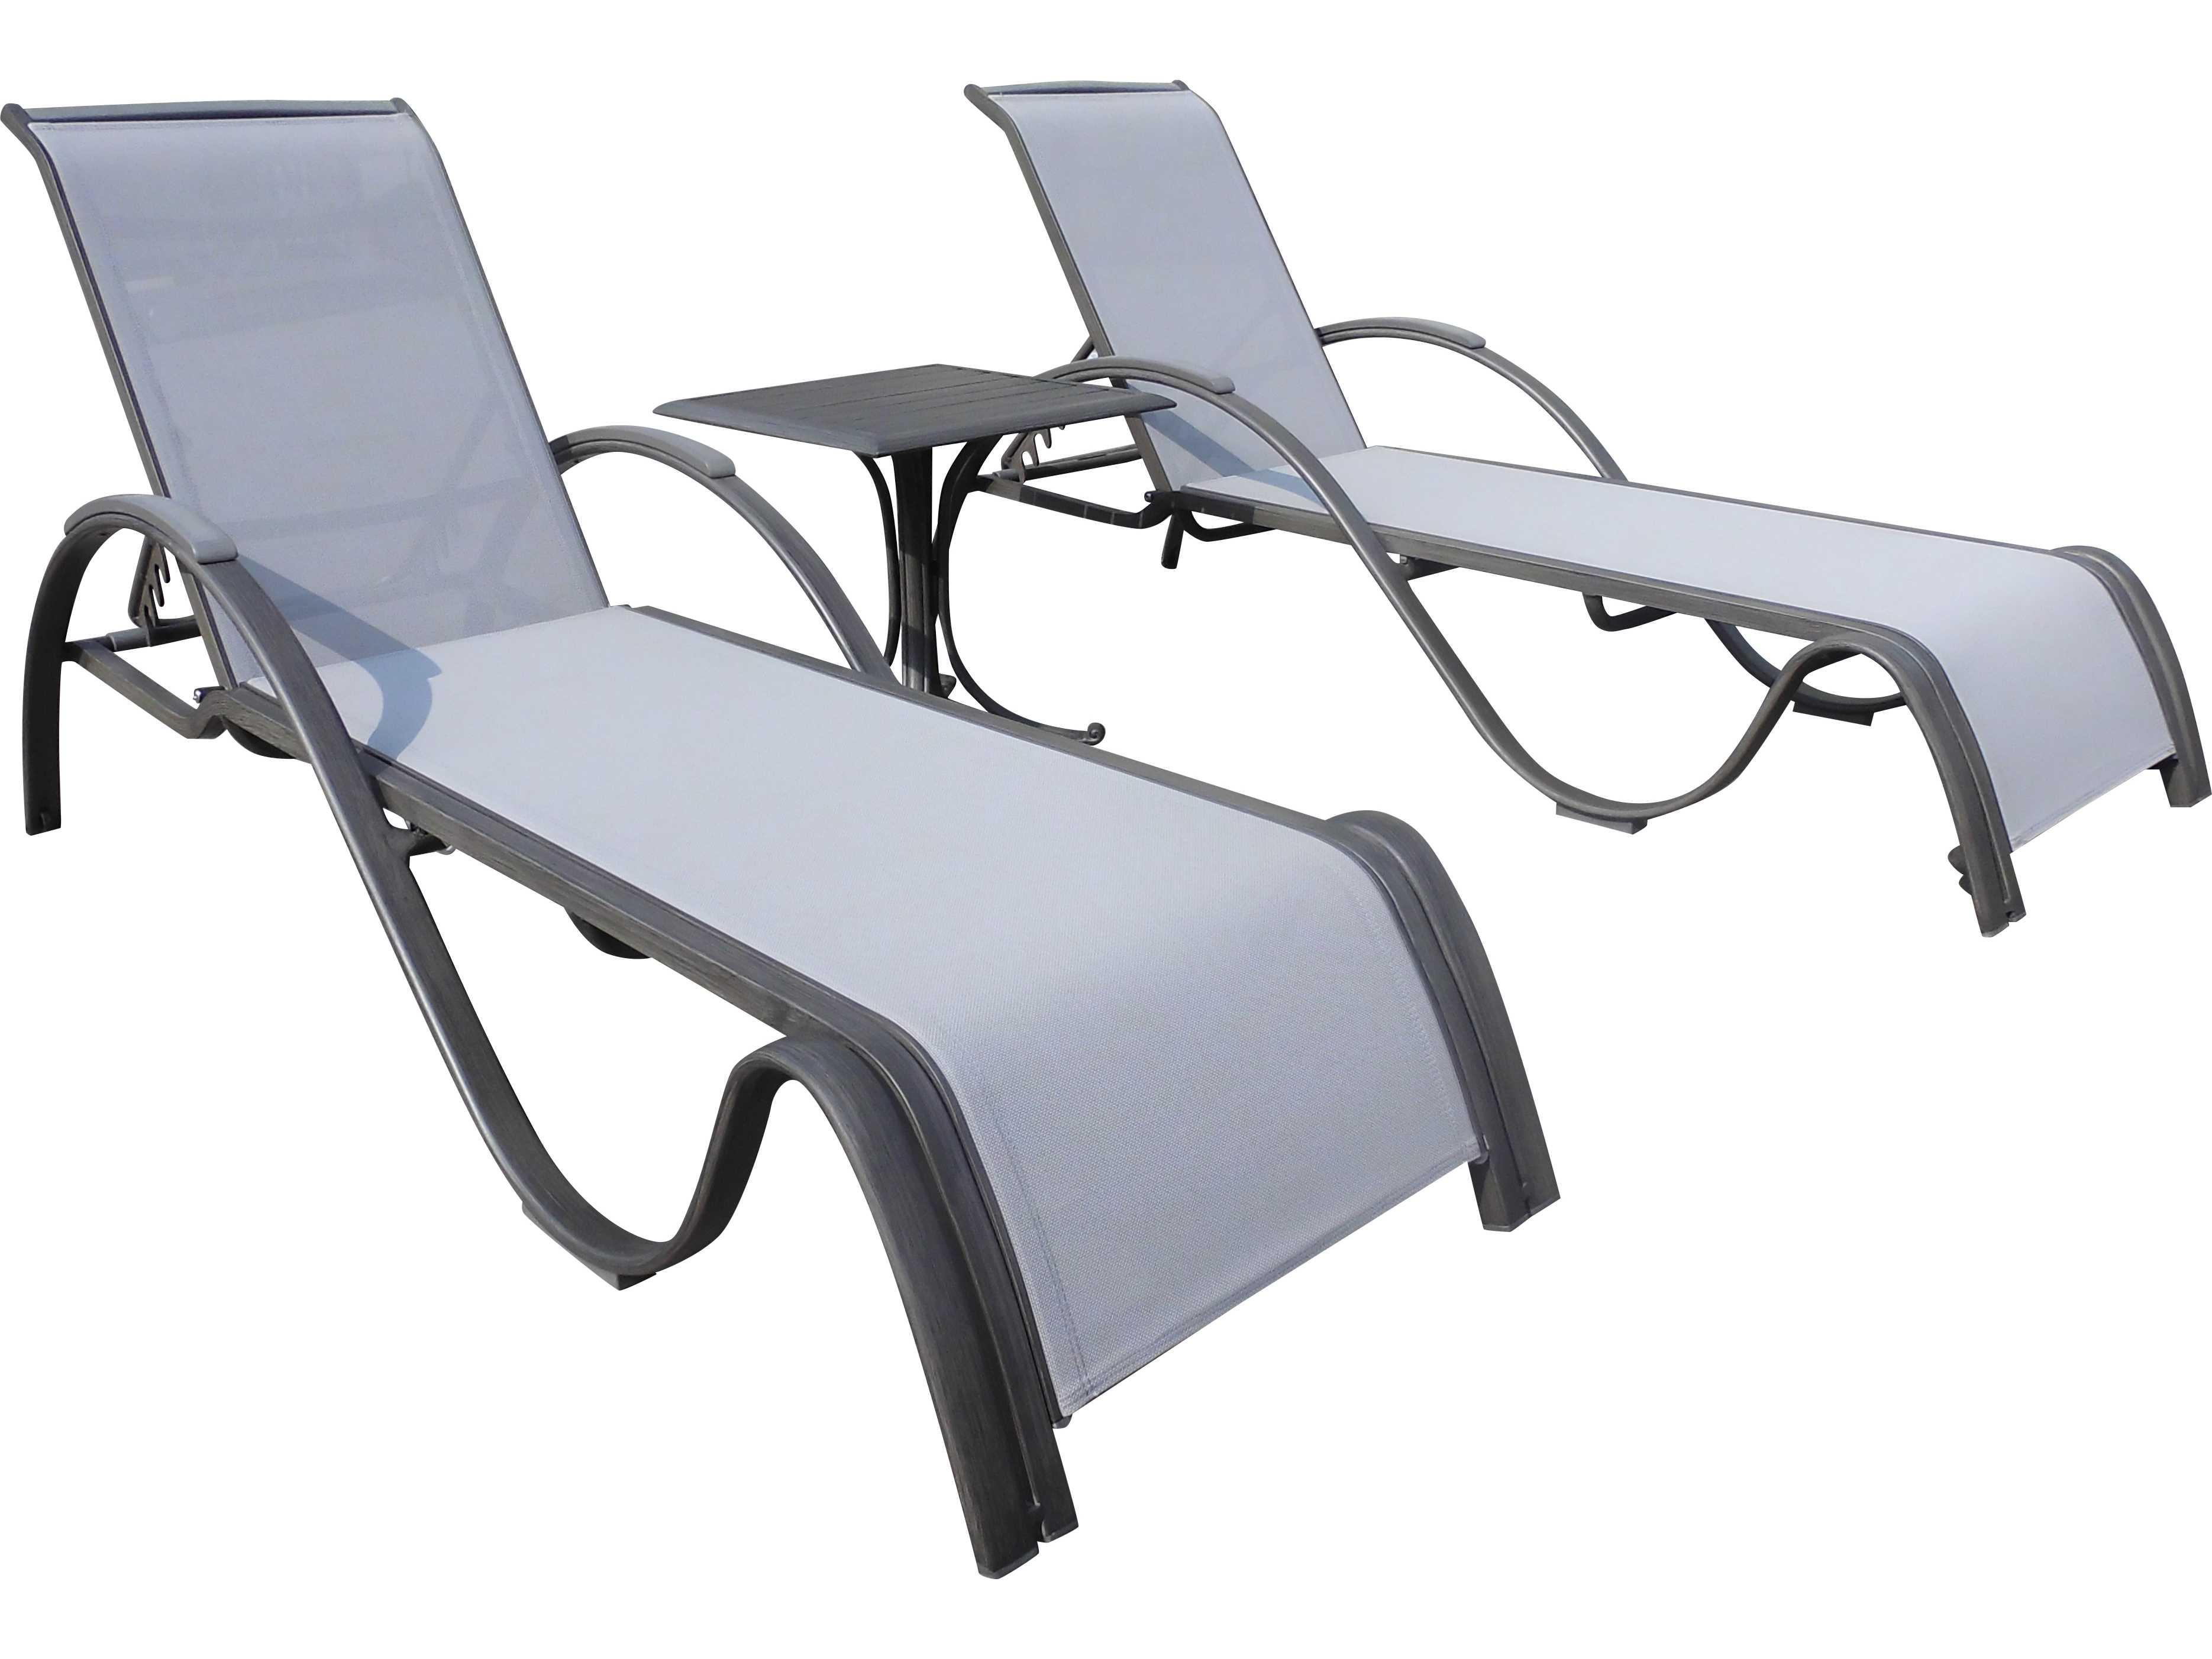 panama jack newport beach wicker 3 pc chaise lounge set. Black Bedroom Furniture Sets. Home Design Ideas